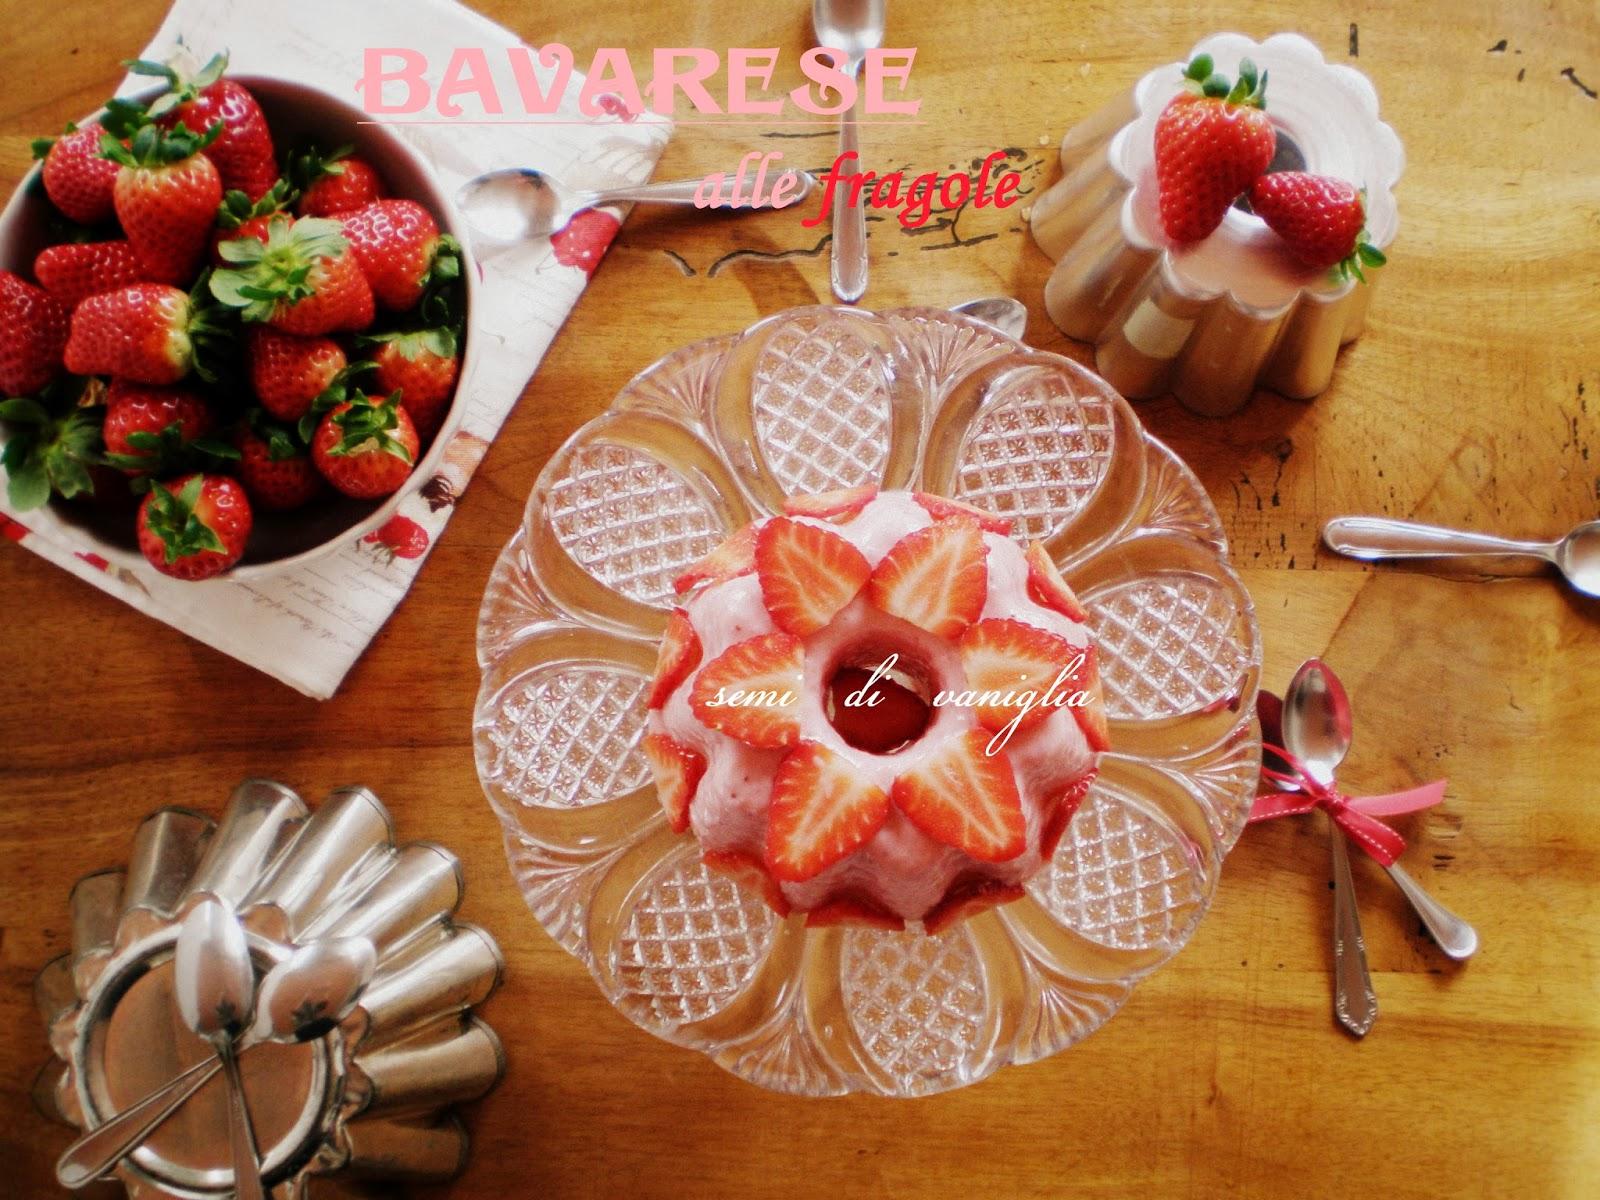 Semi di vaniglia bavarese alle fragole light - Bagno punta canna sottomarina ...